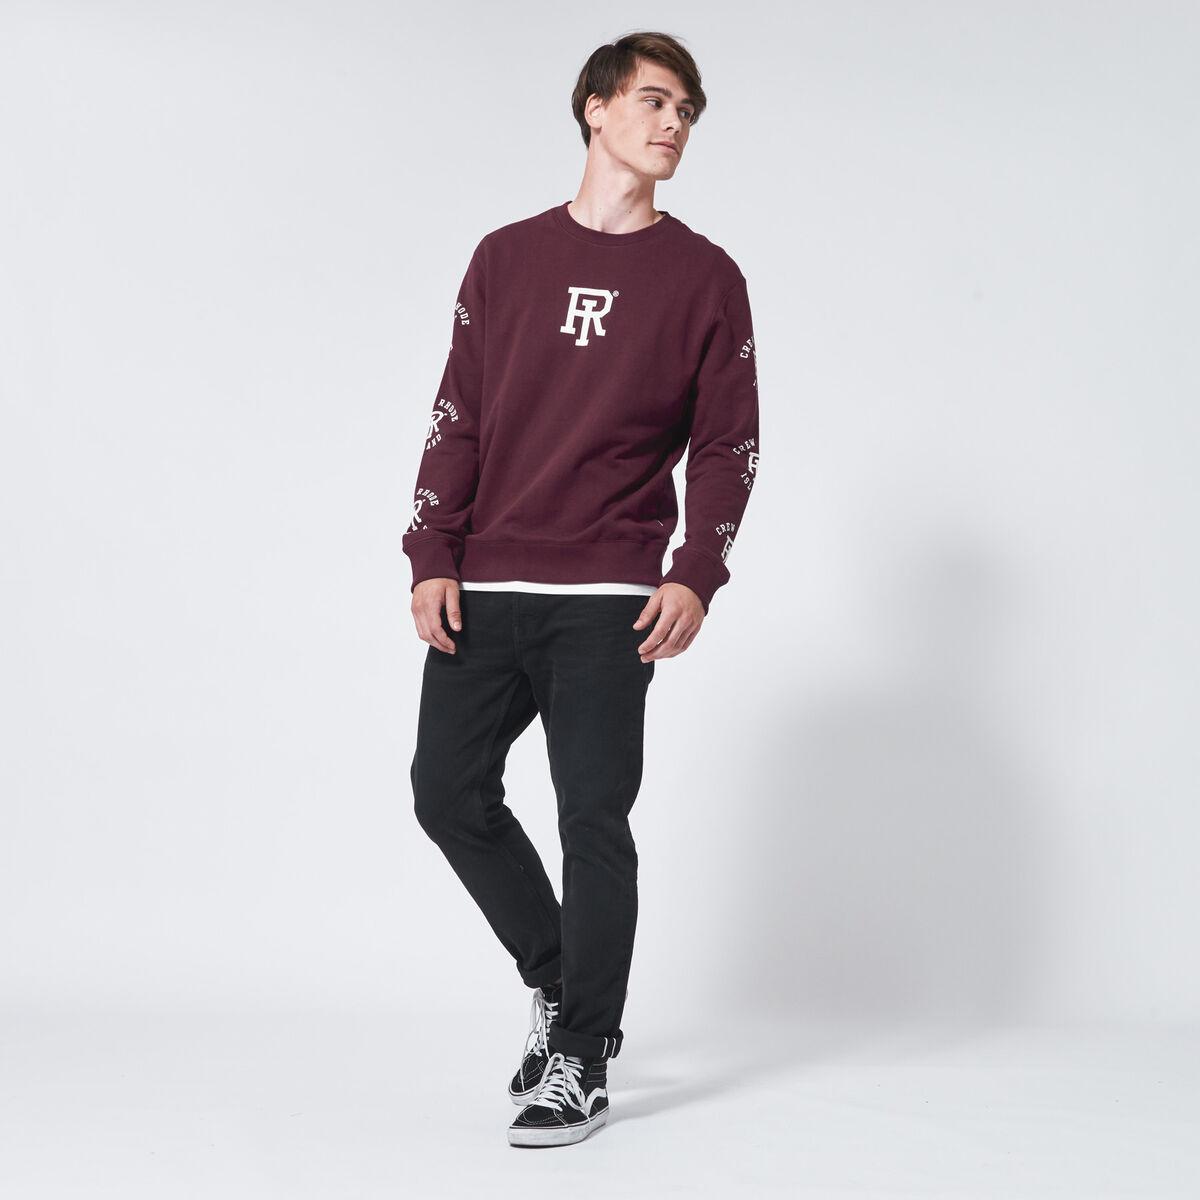 Sweater Sutton sleeve